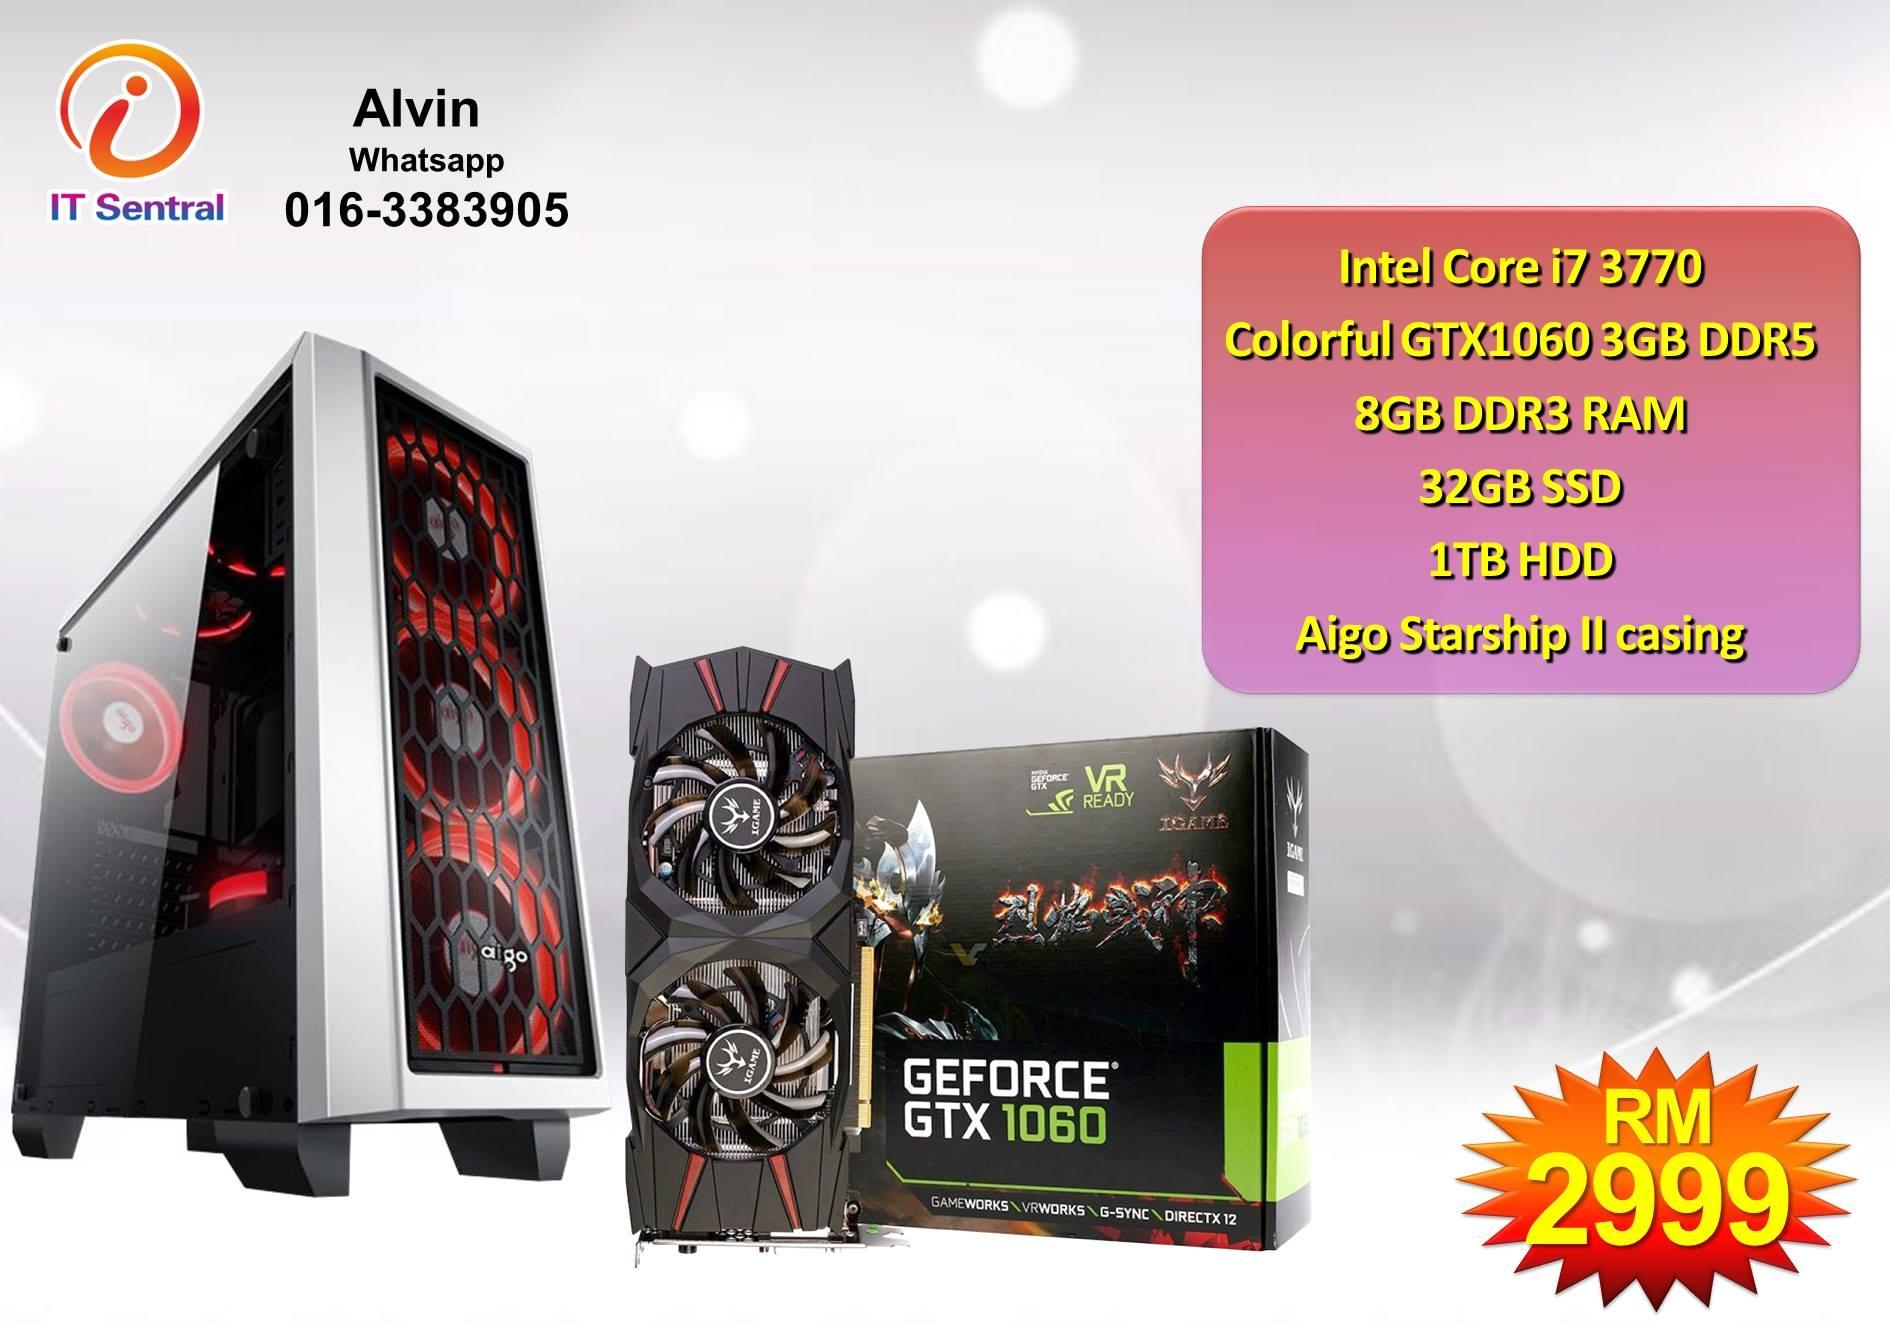 GTX1060 3GB DDR5 Core i7 gaming PC